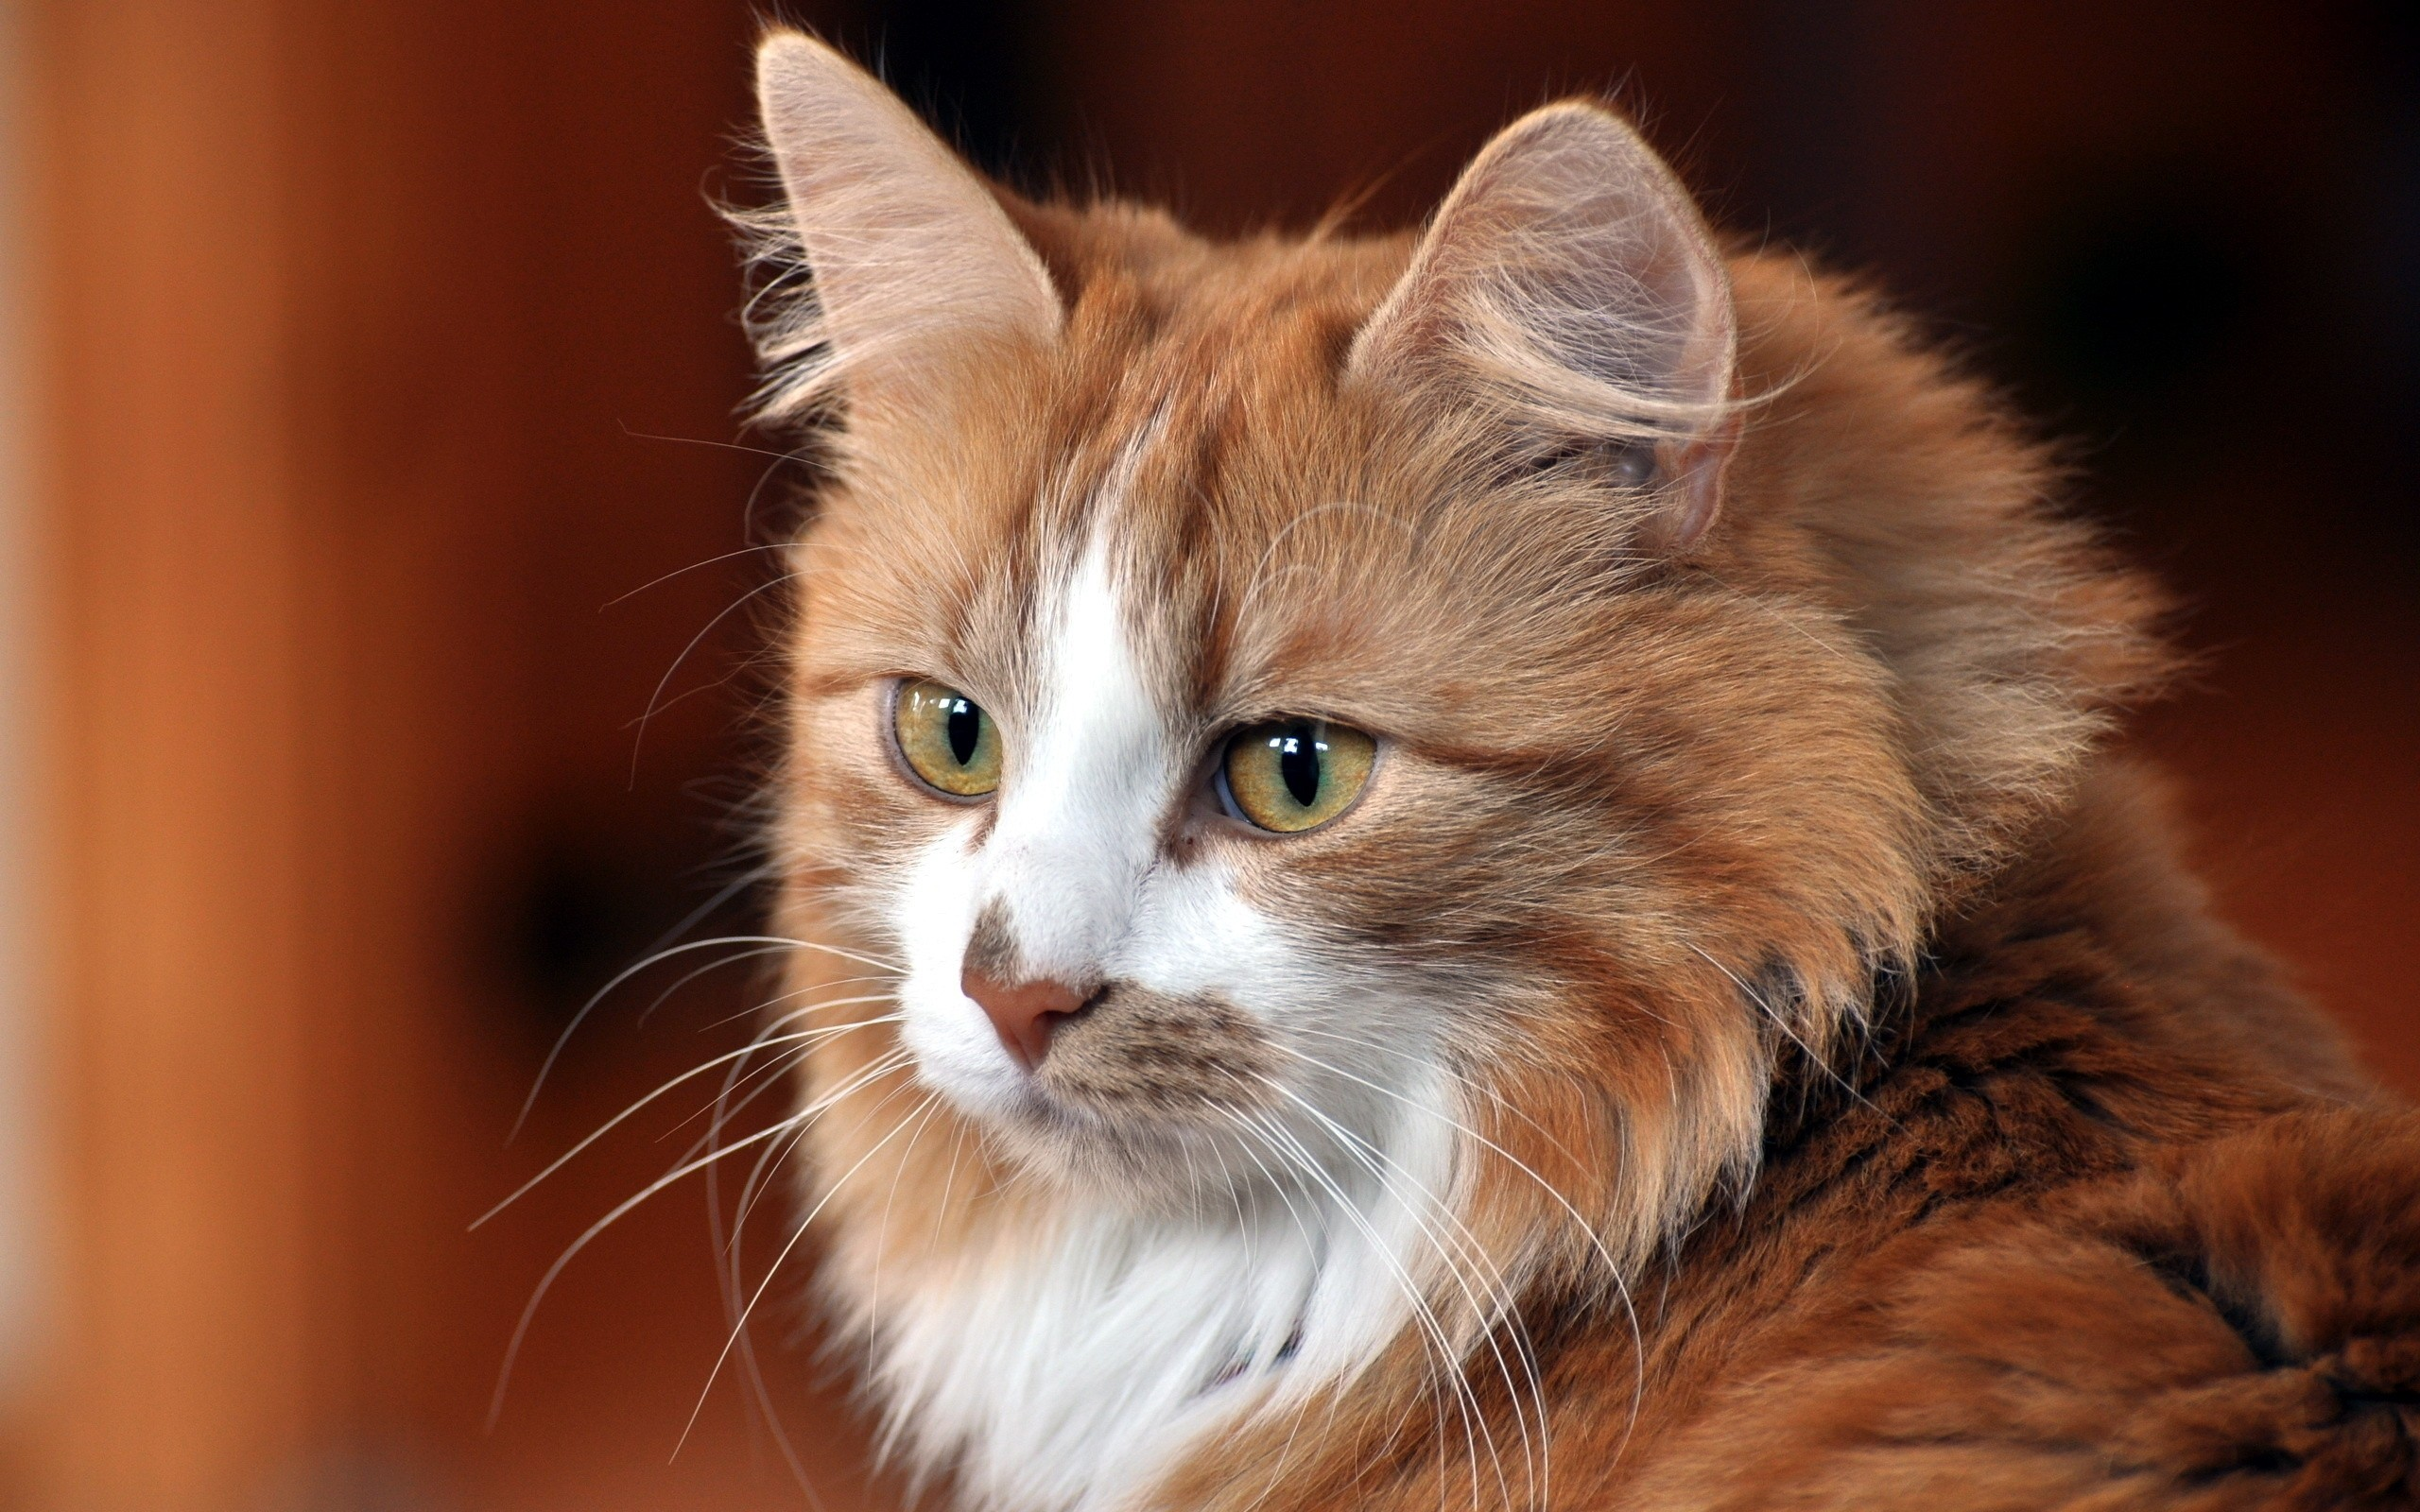 Iphone X Glitter Wallpaper Cat Face Cat Cool Cat Cute Cat Wallpaper Hd Wallpapers